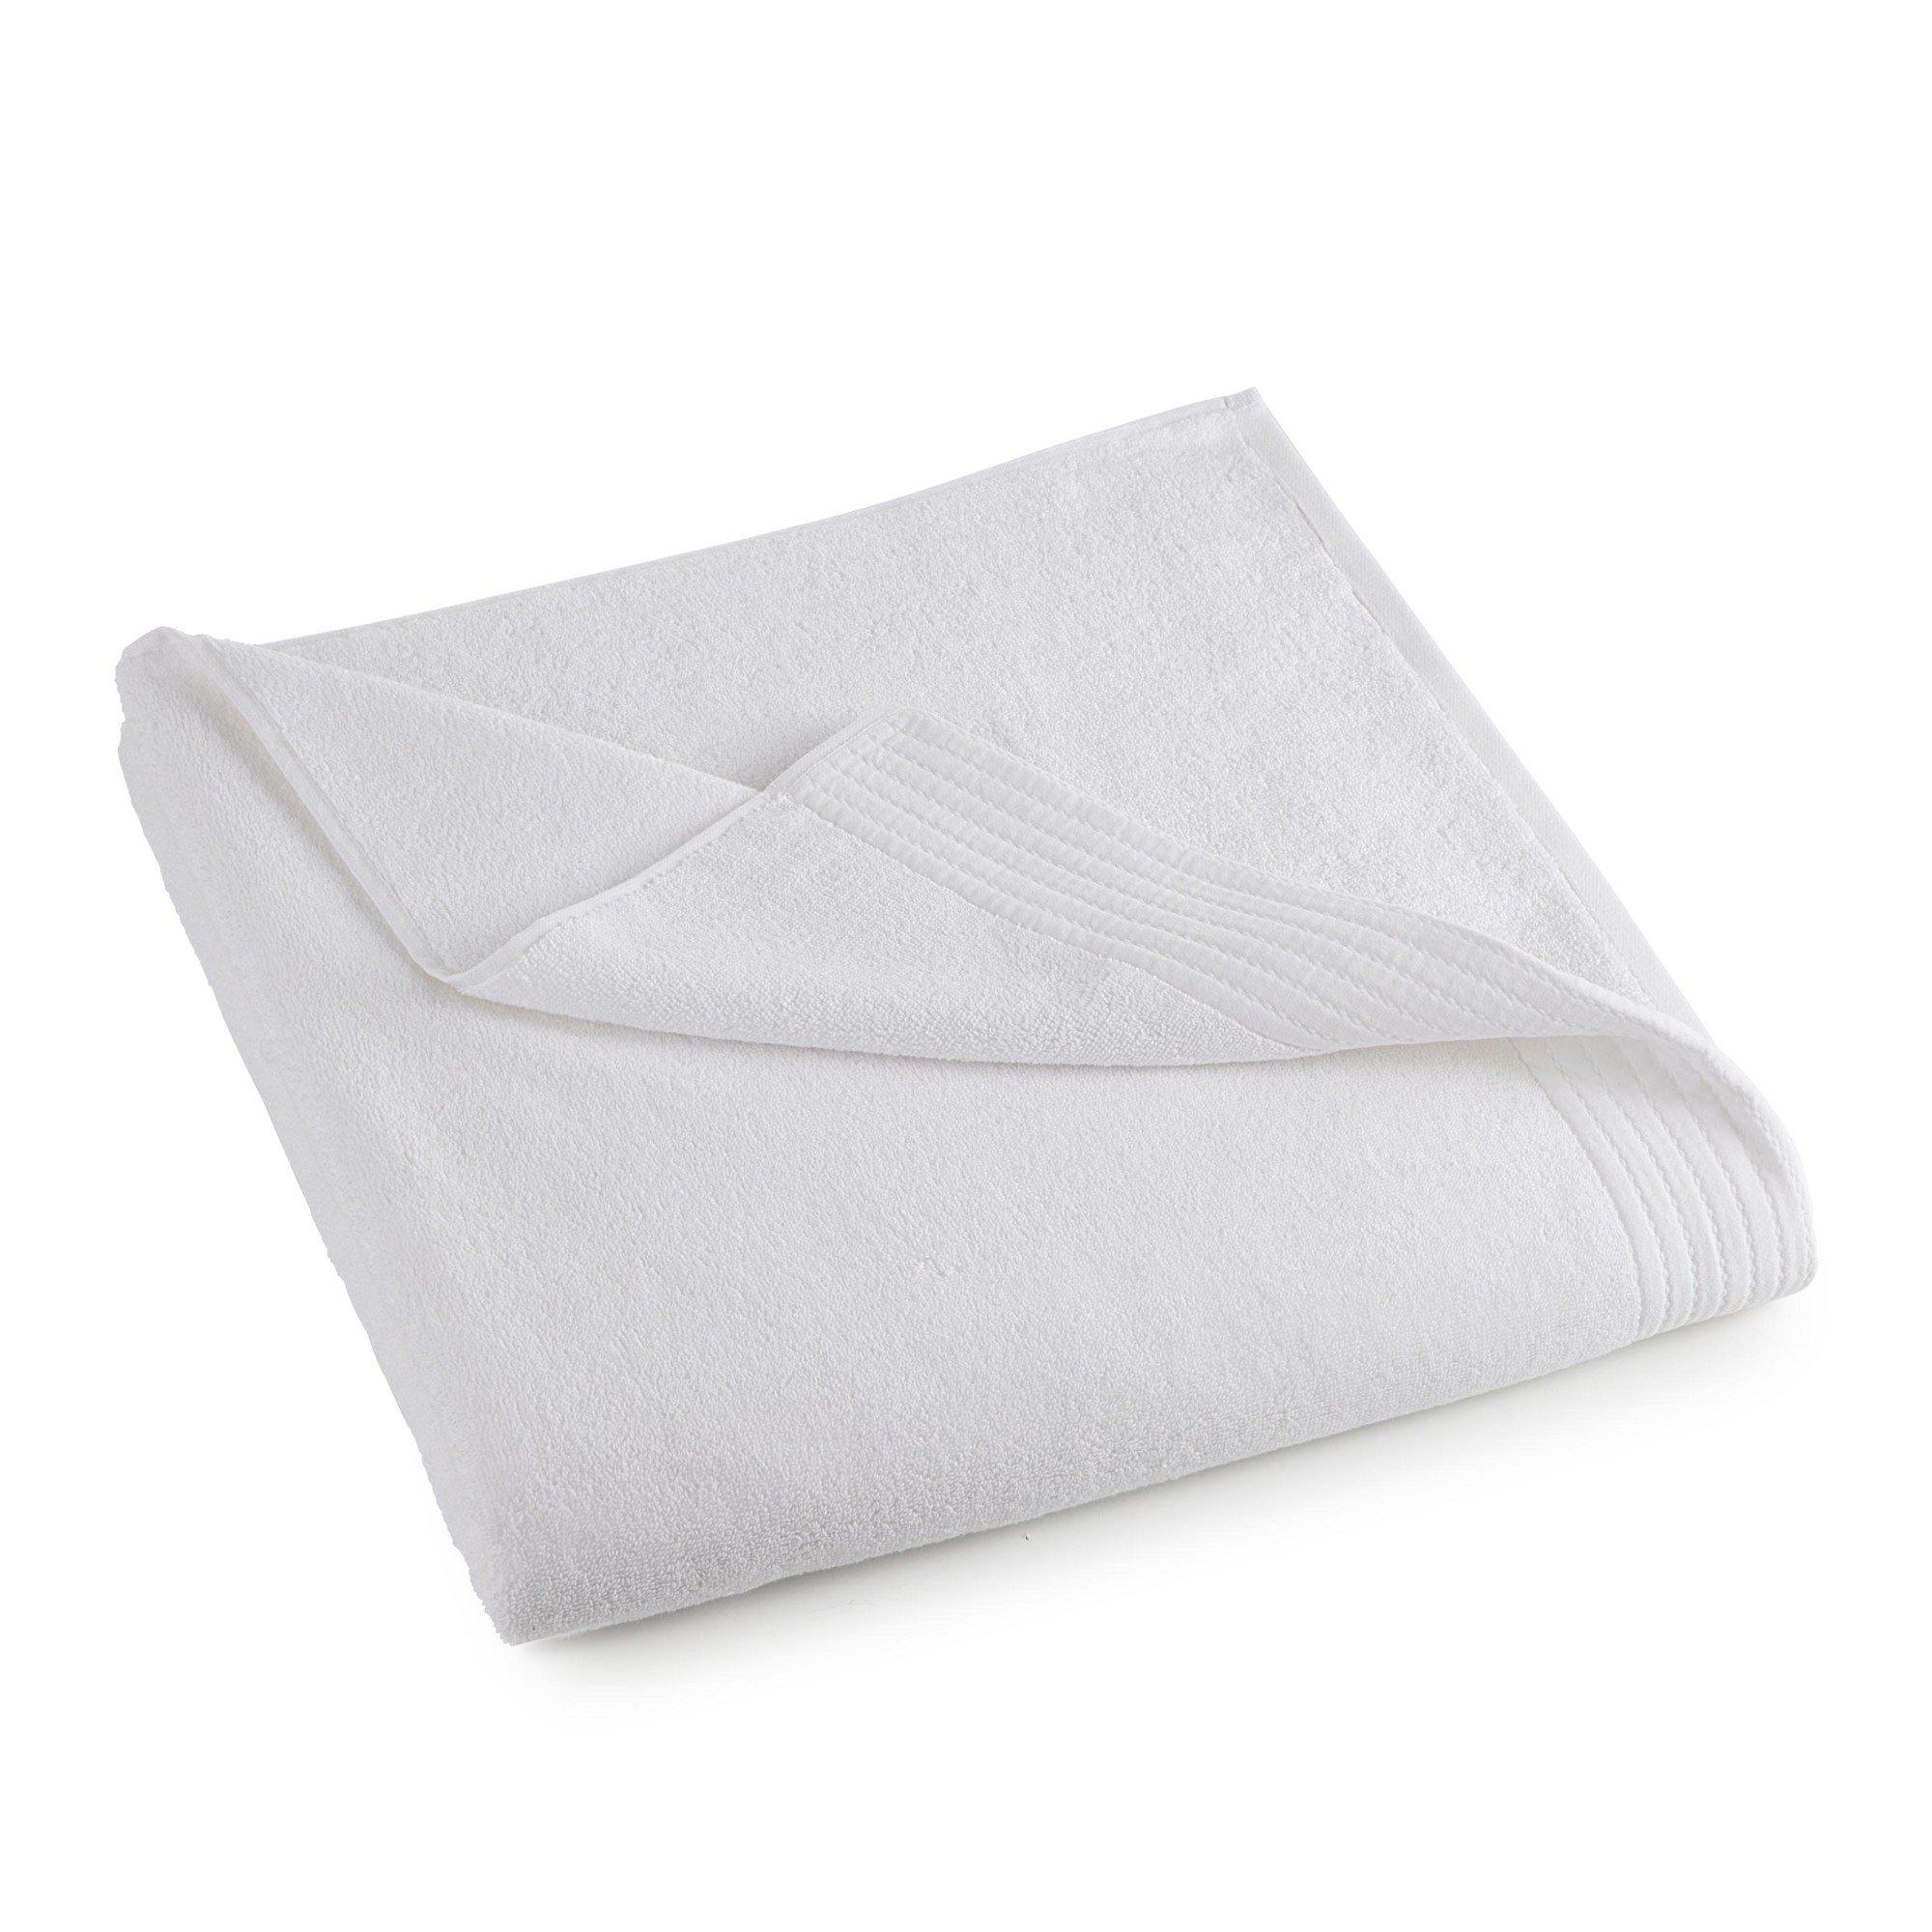 Grand Patrician Turkish Luxury, Bath Sheet, White